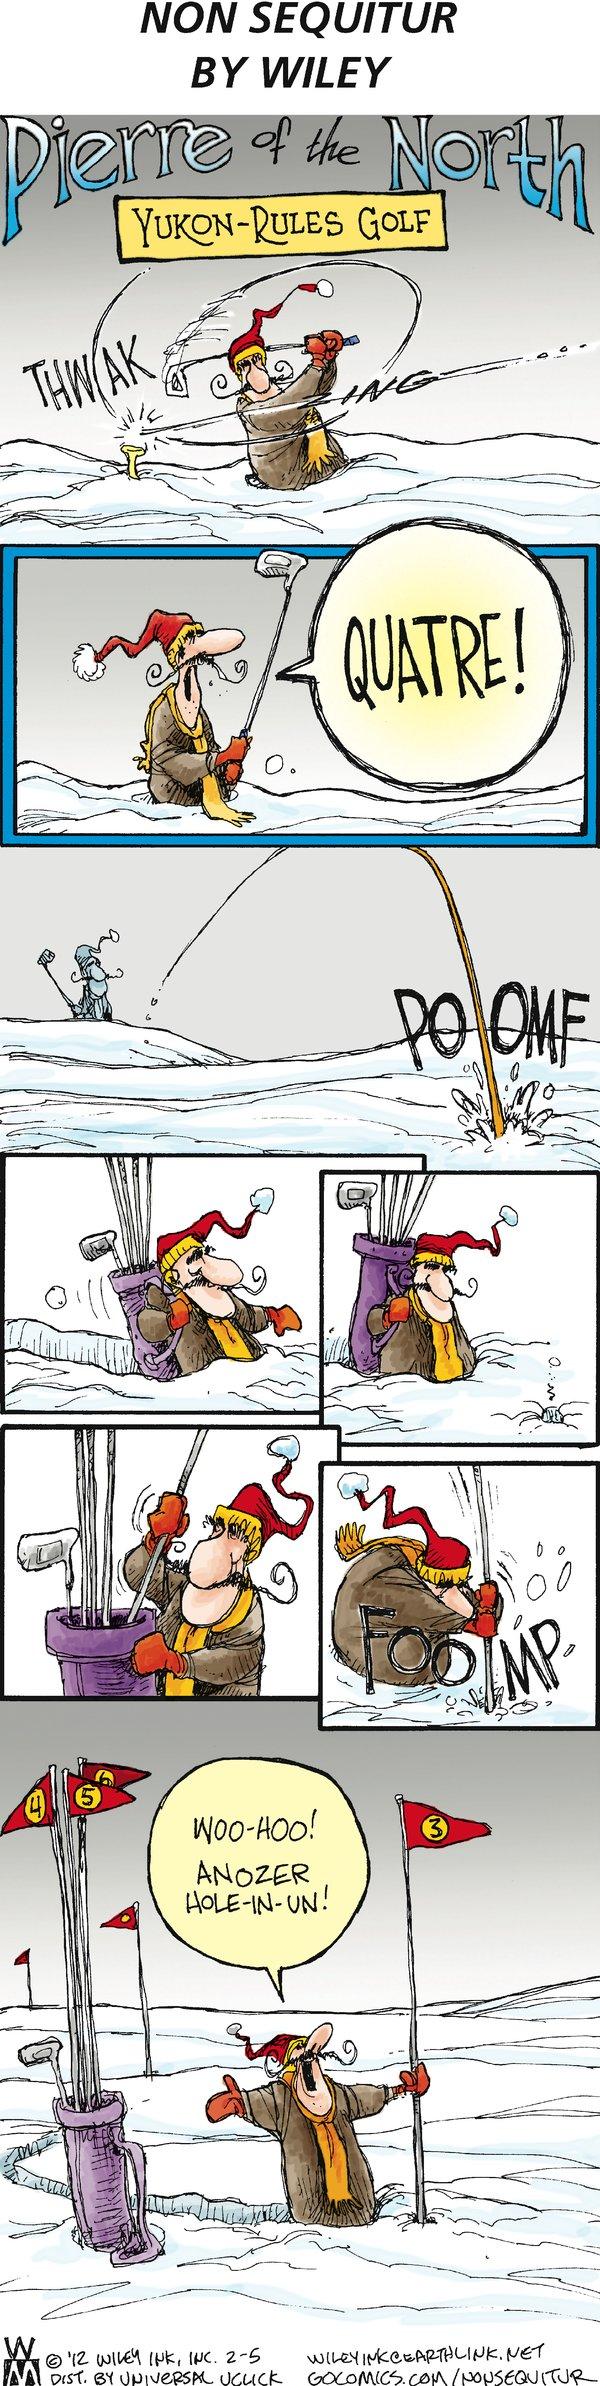 Pierre: Quatre! Woo-hoo! Anozer hole-in-un! Pierre of the North Yukon-Rules Golf